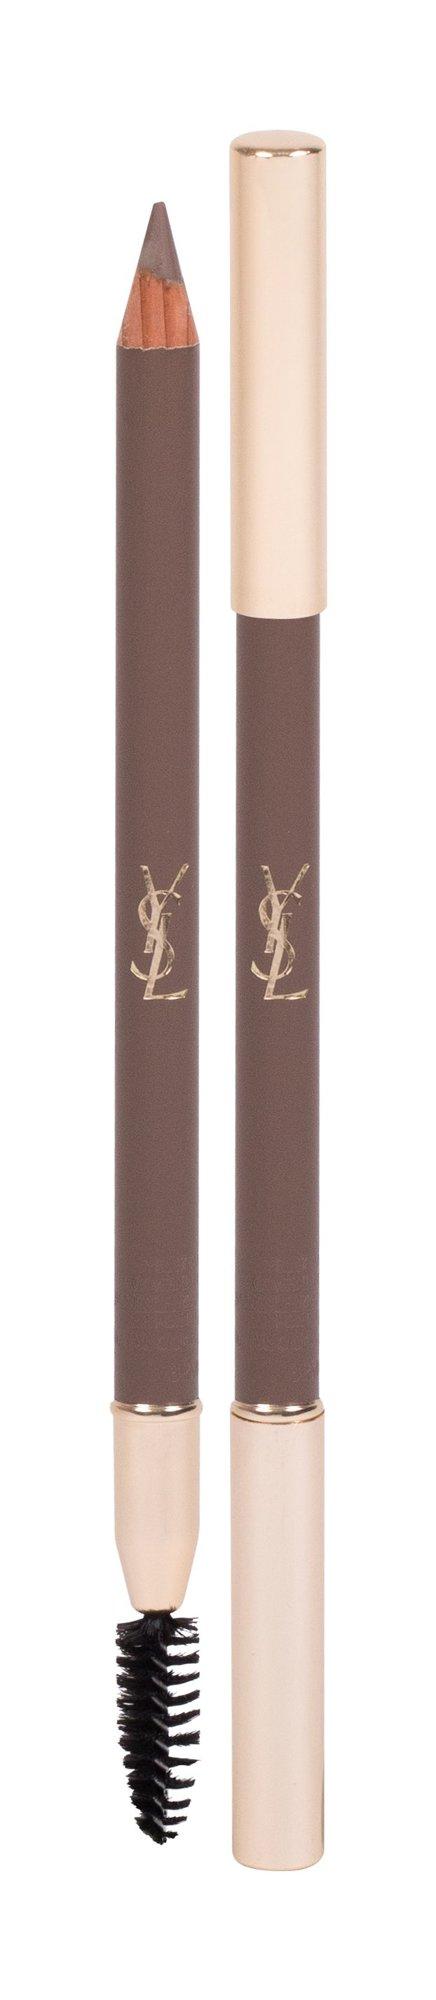 Yves Saint Laurent Dessin Des Sourcils Eyebrow Pencil 1,3ml 2 Brun Profond